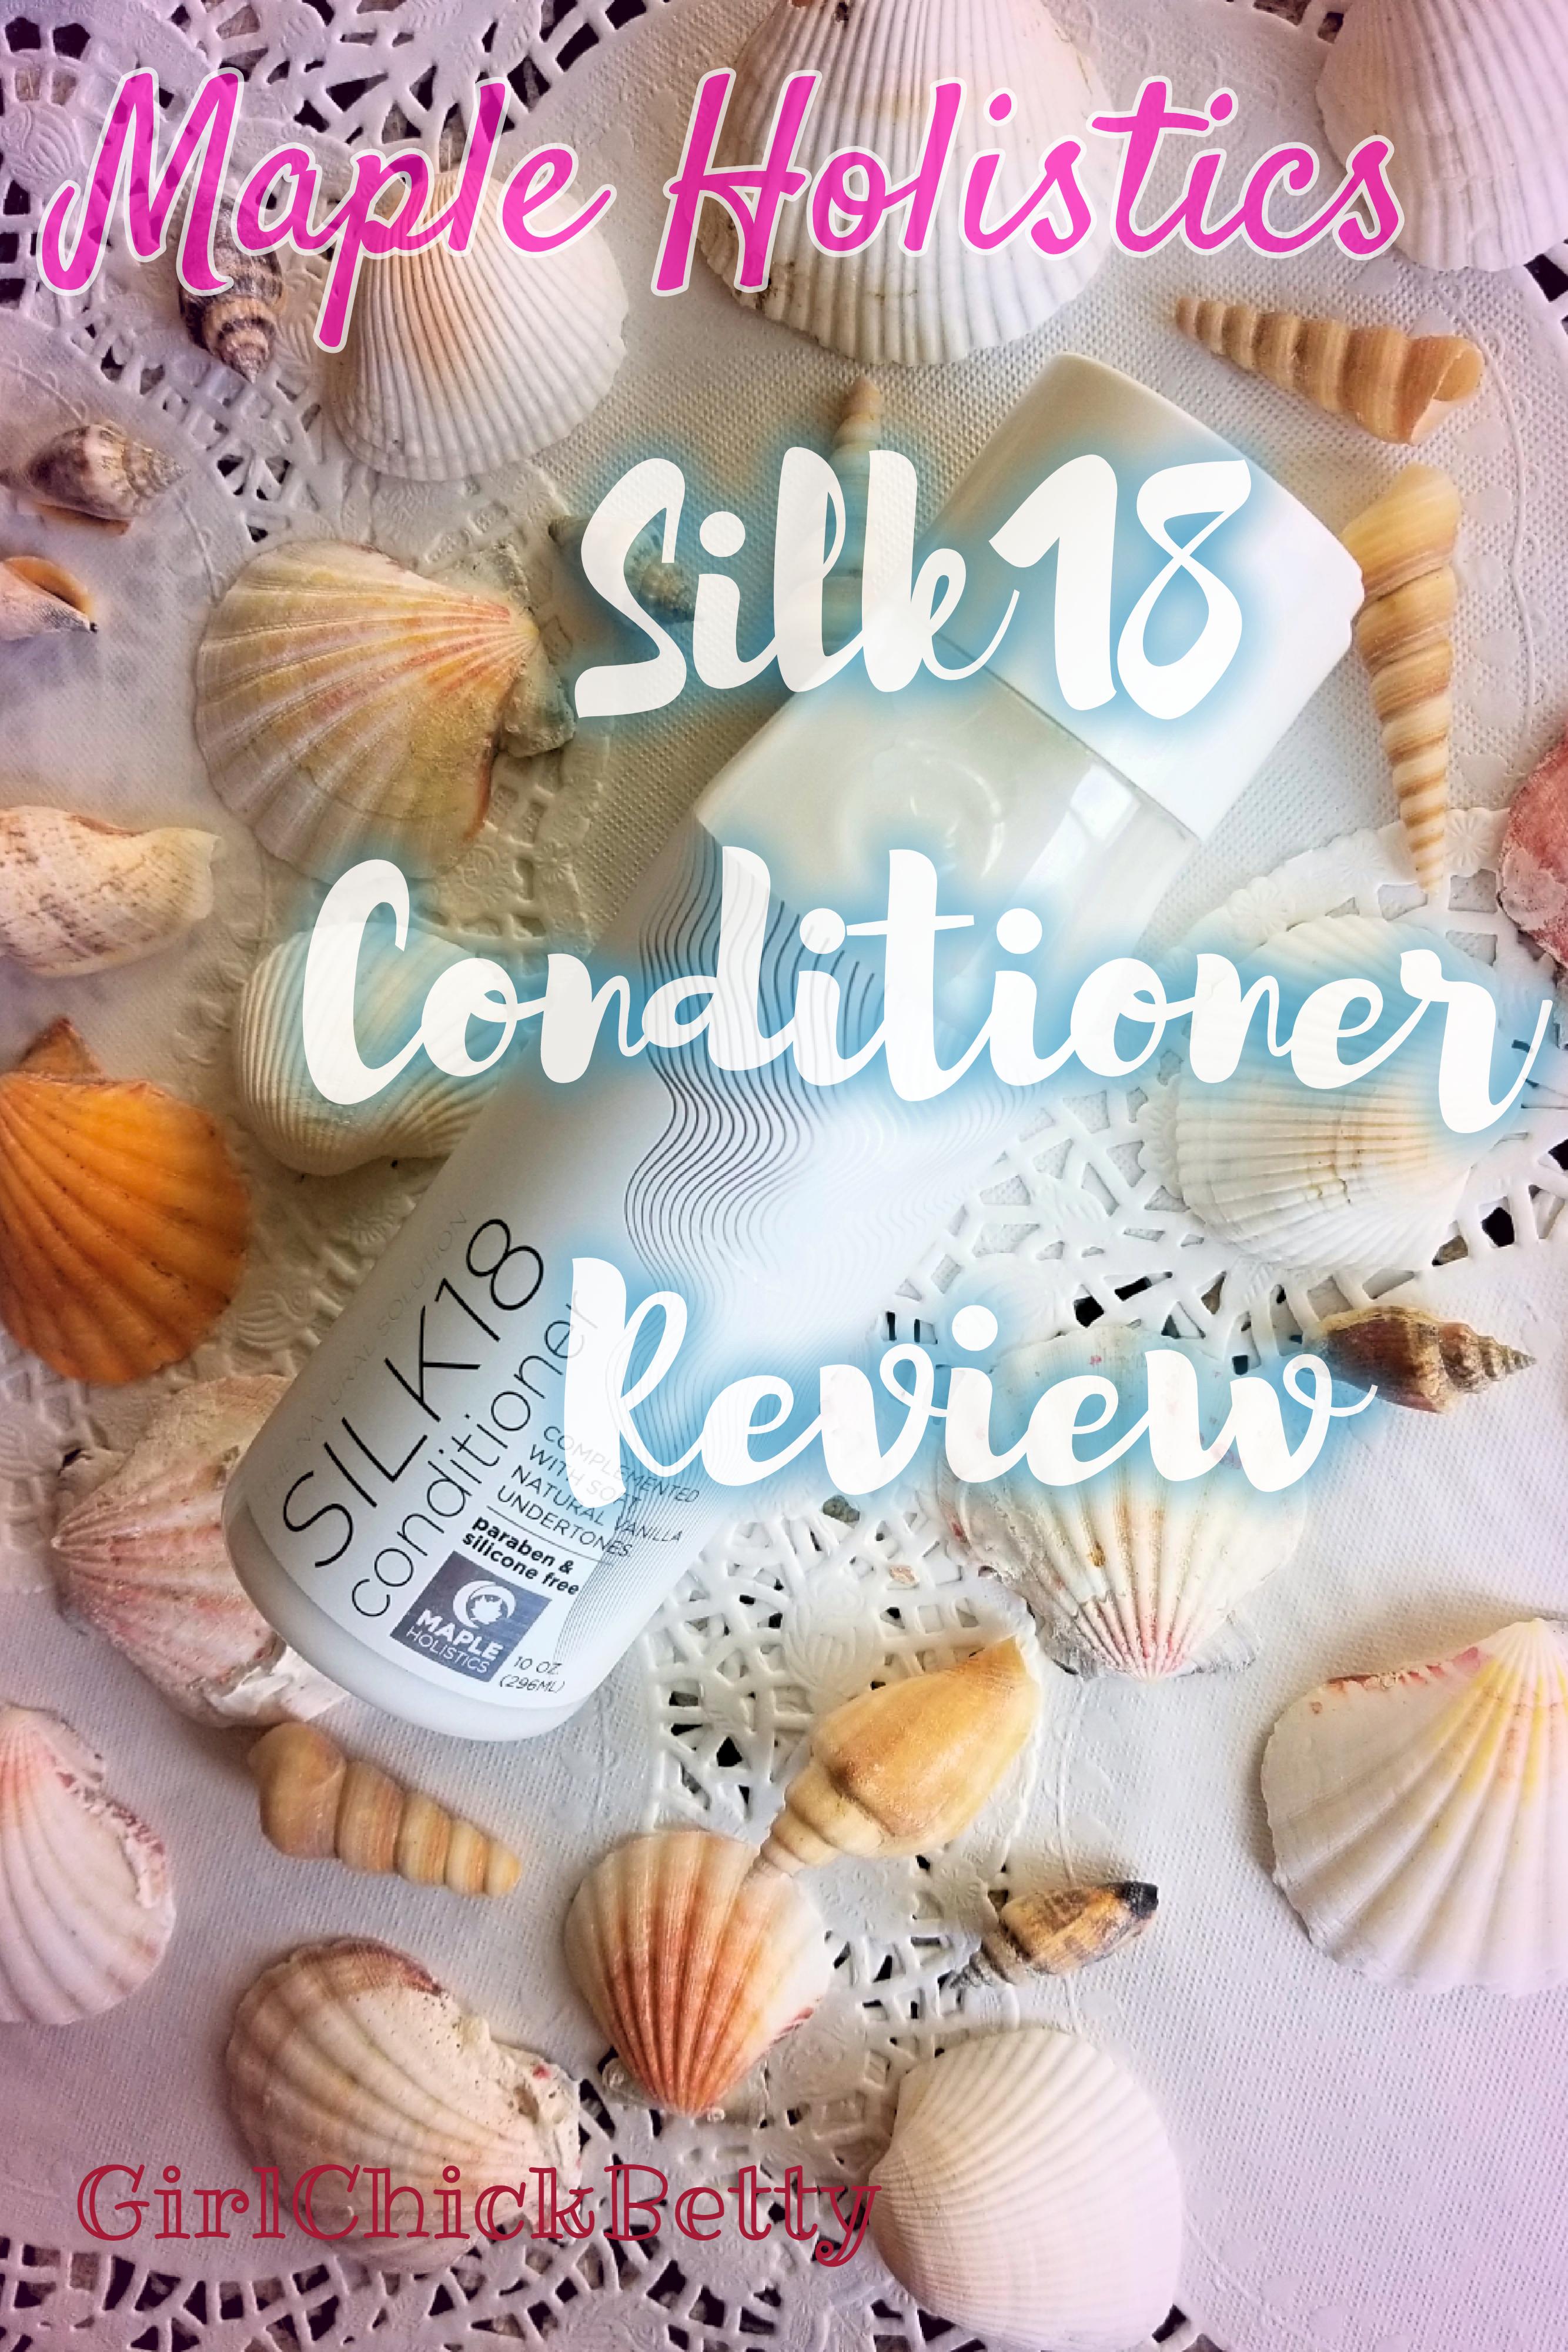 Maple Holistics Silk18 Conditioner Review